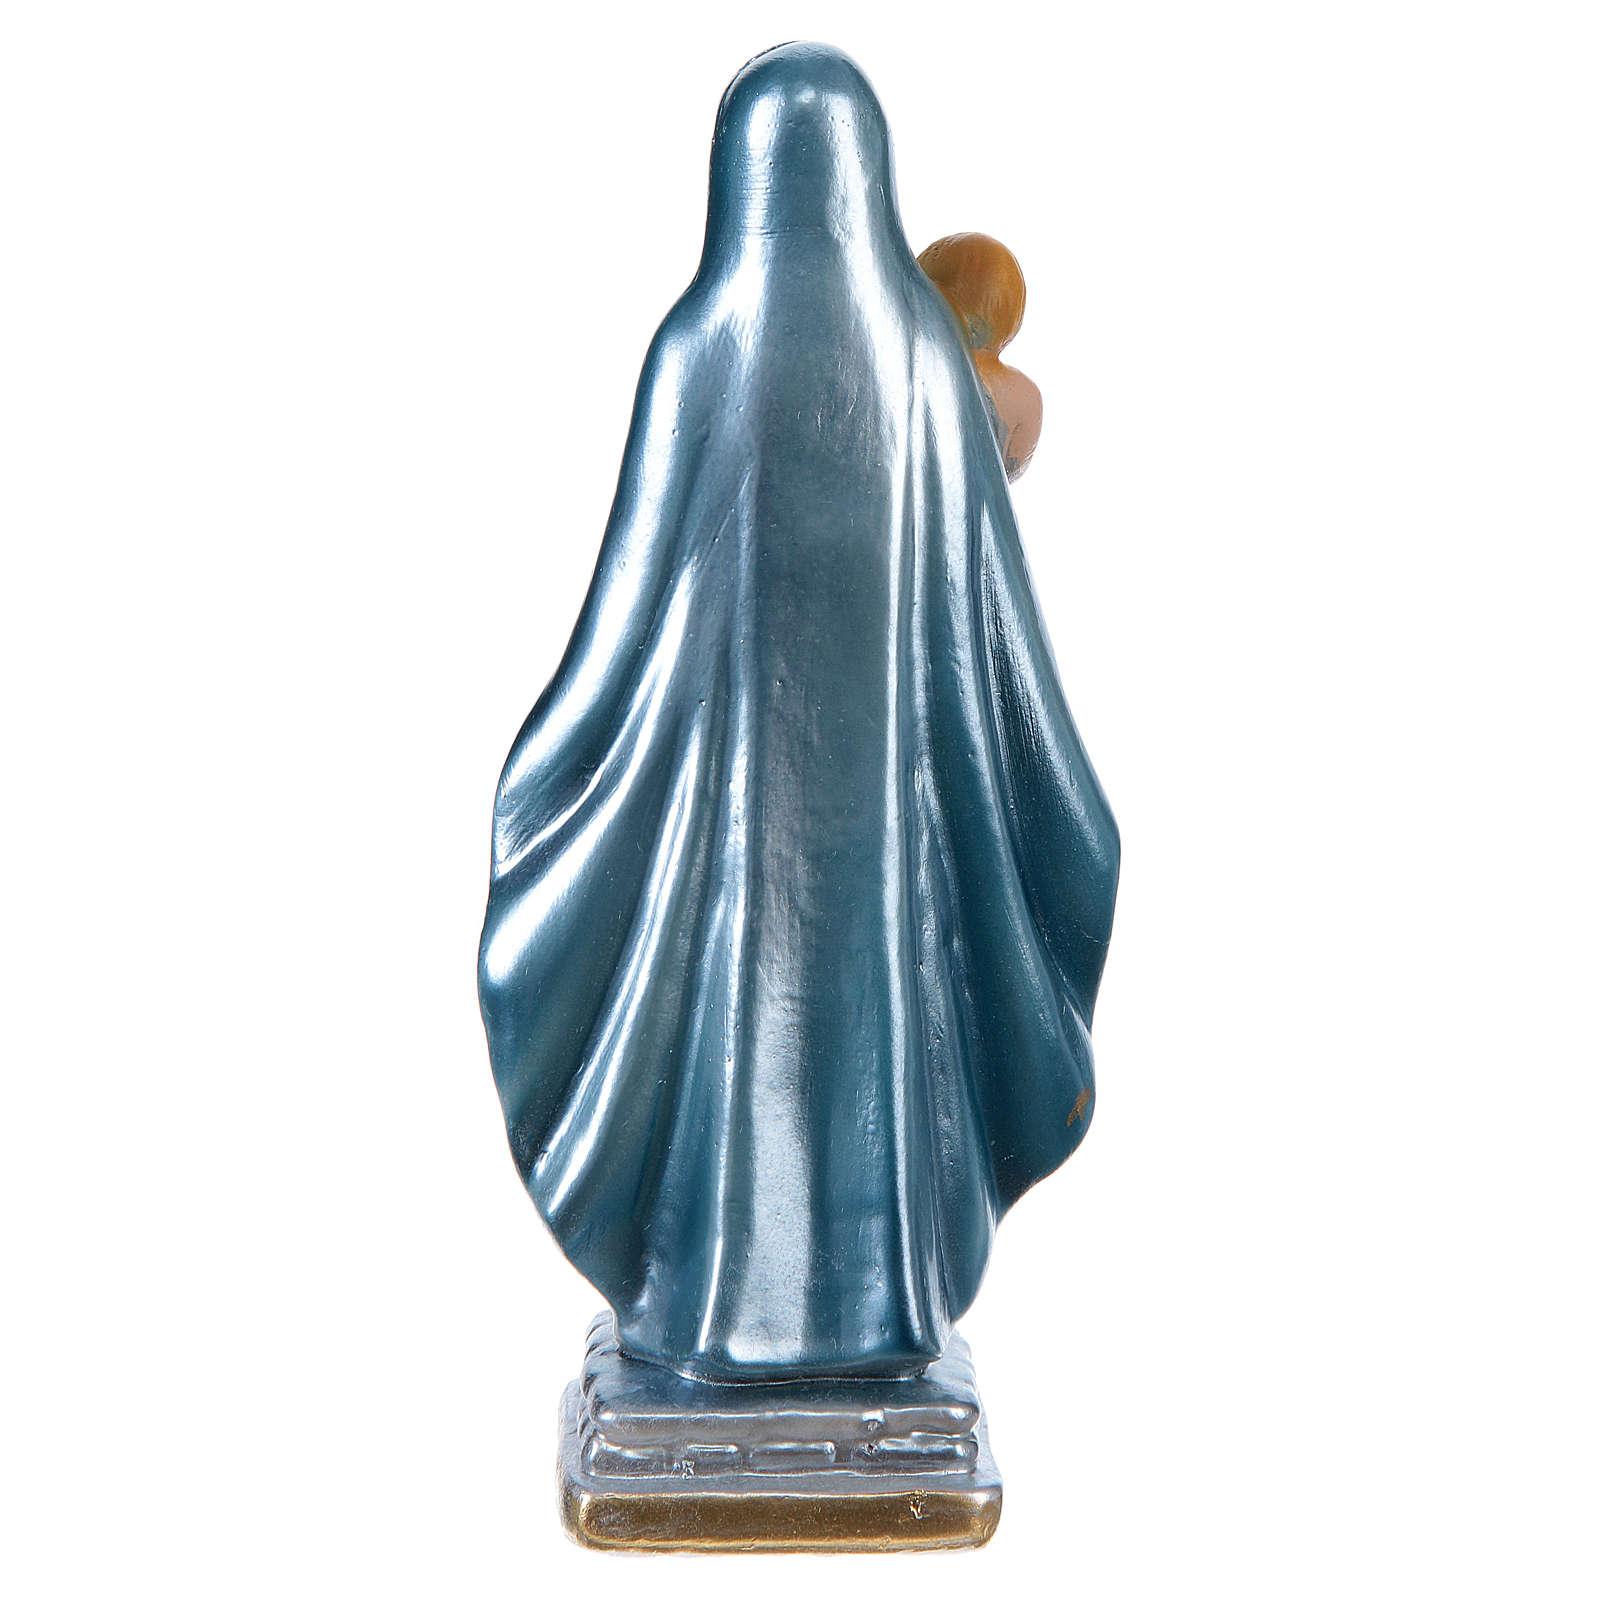 Reina del Castillo 15 cm yeso efecto nacarado 4